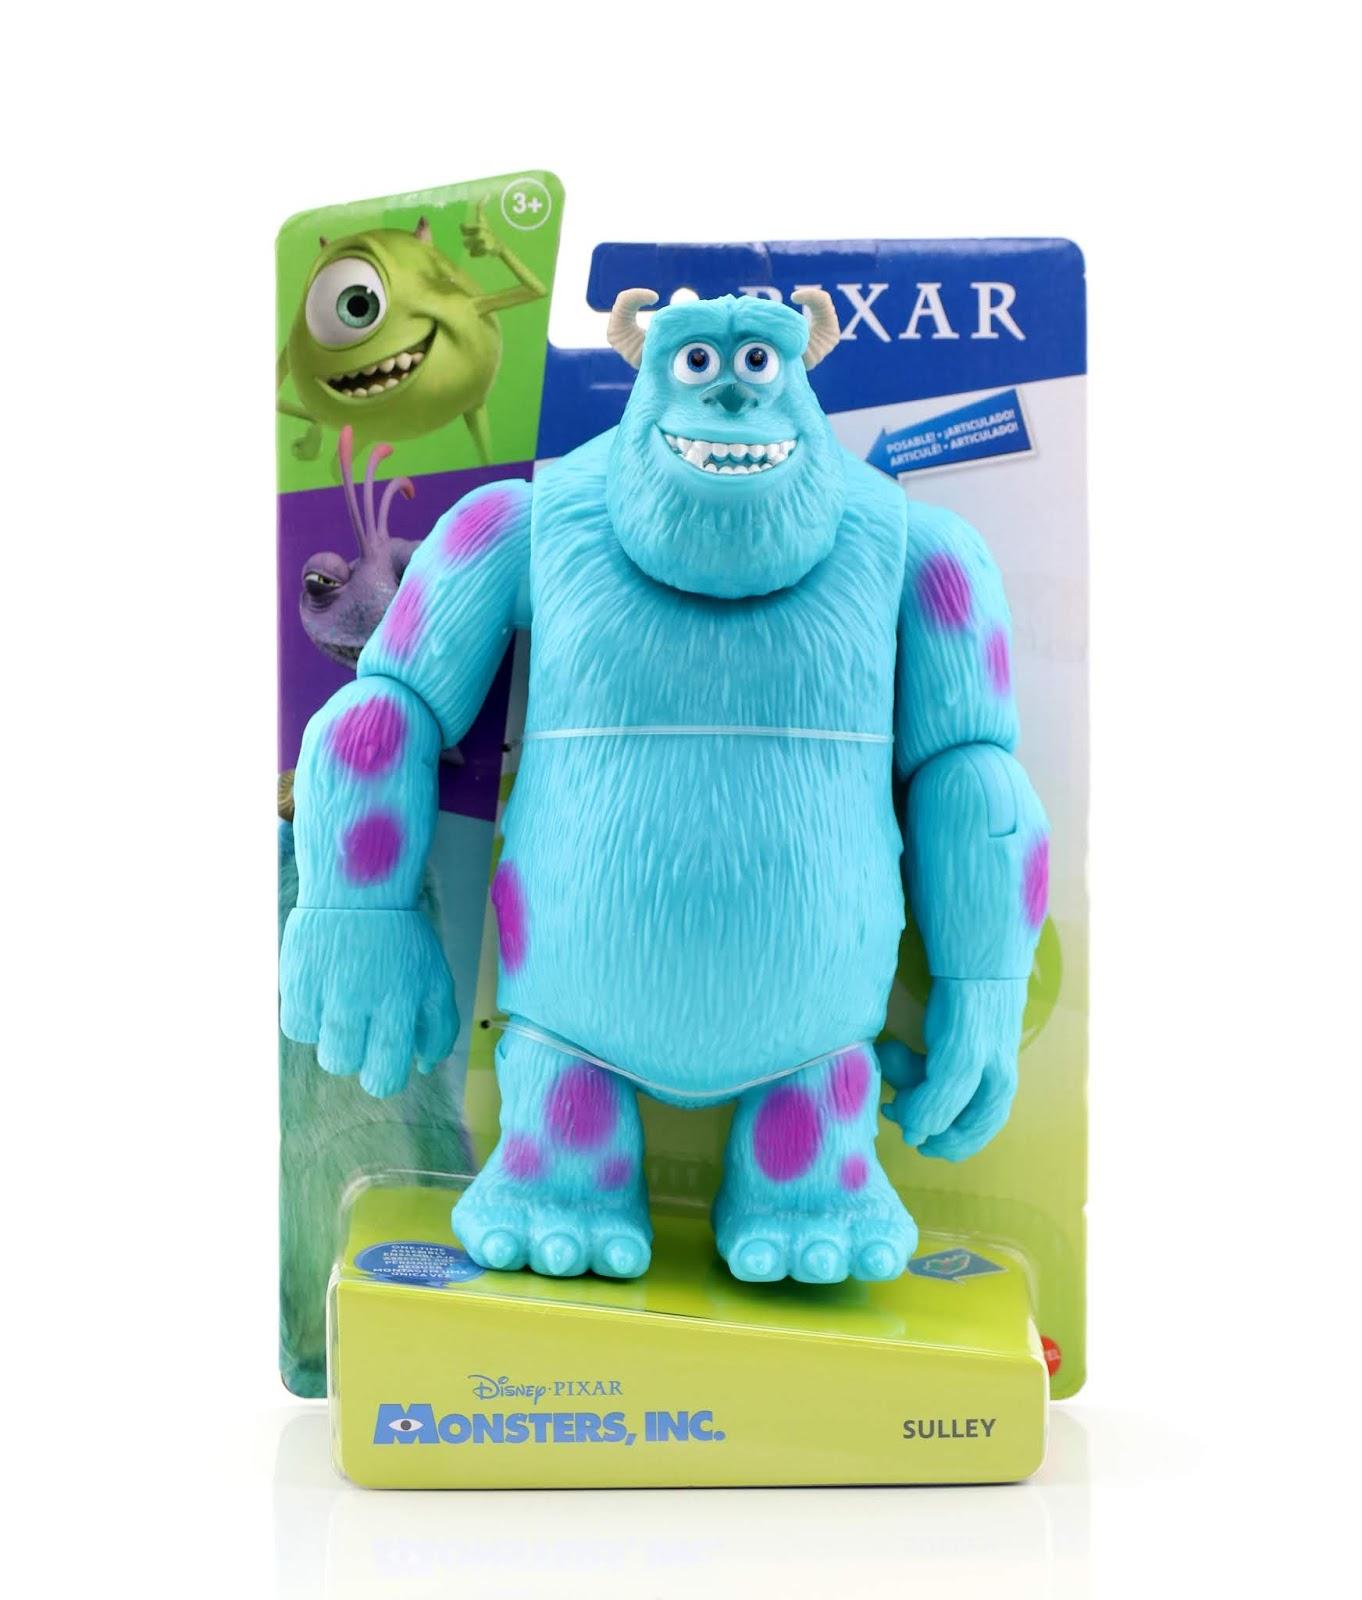 mattel pixar action figures monsters inc sulley